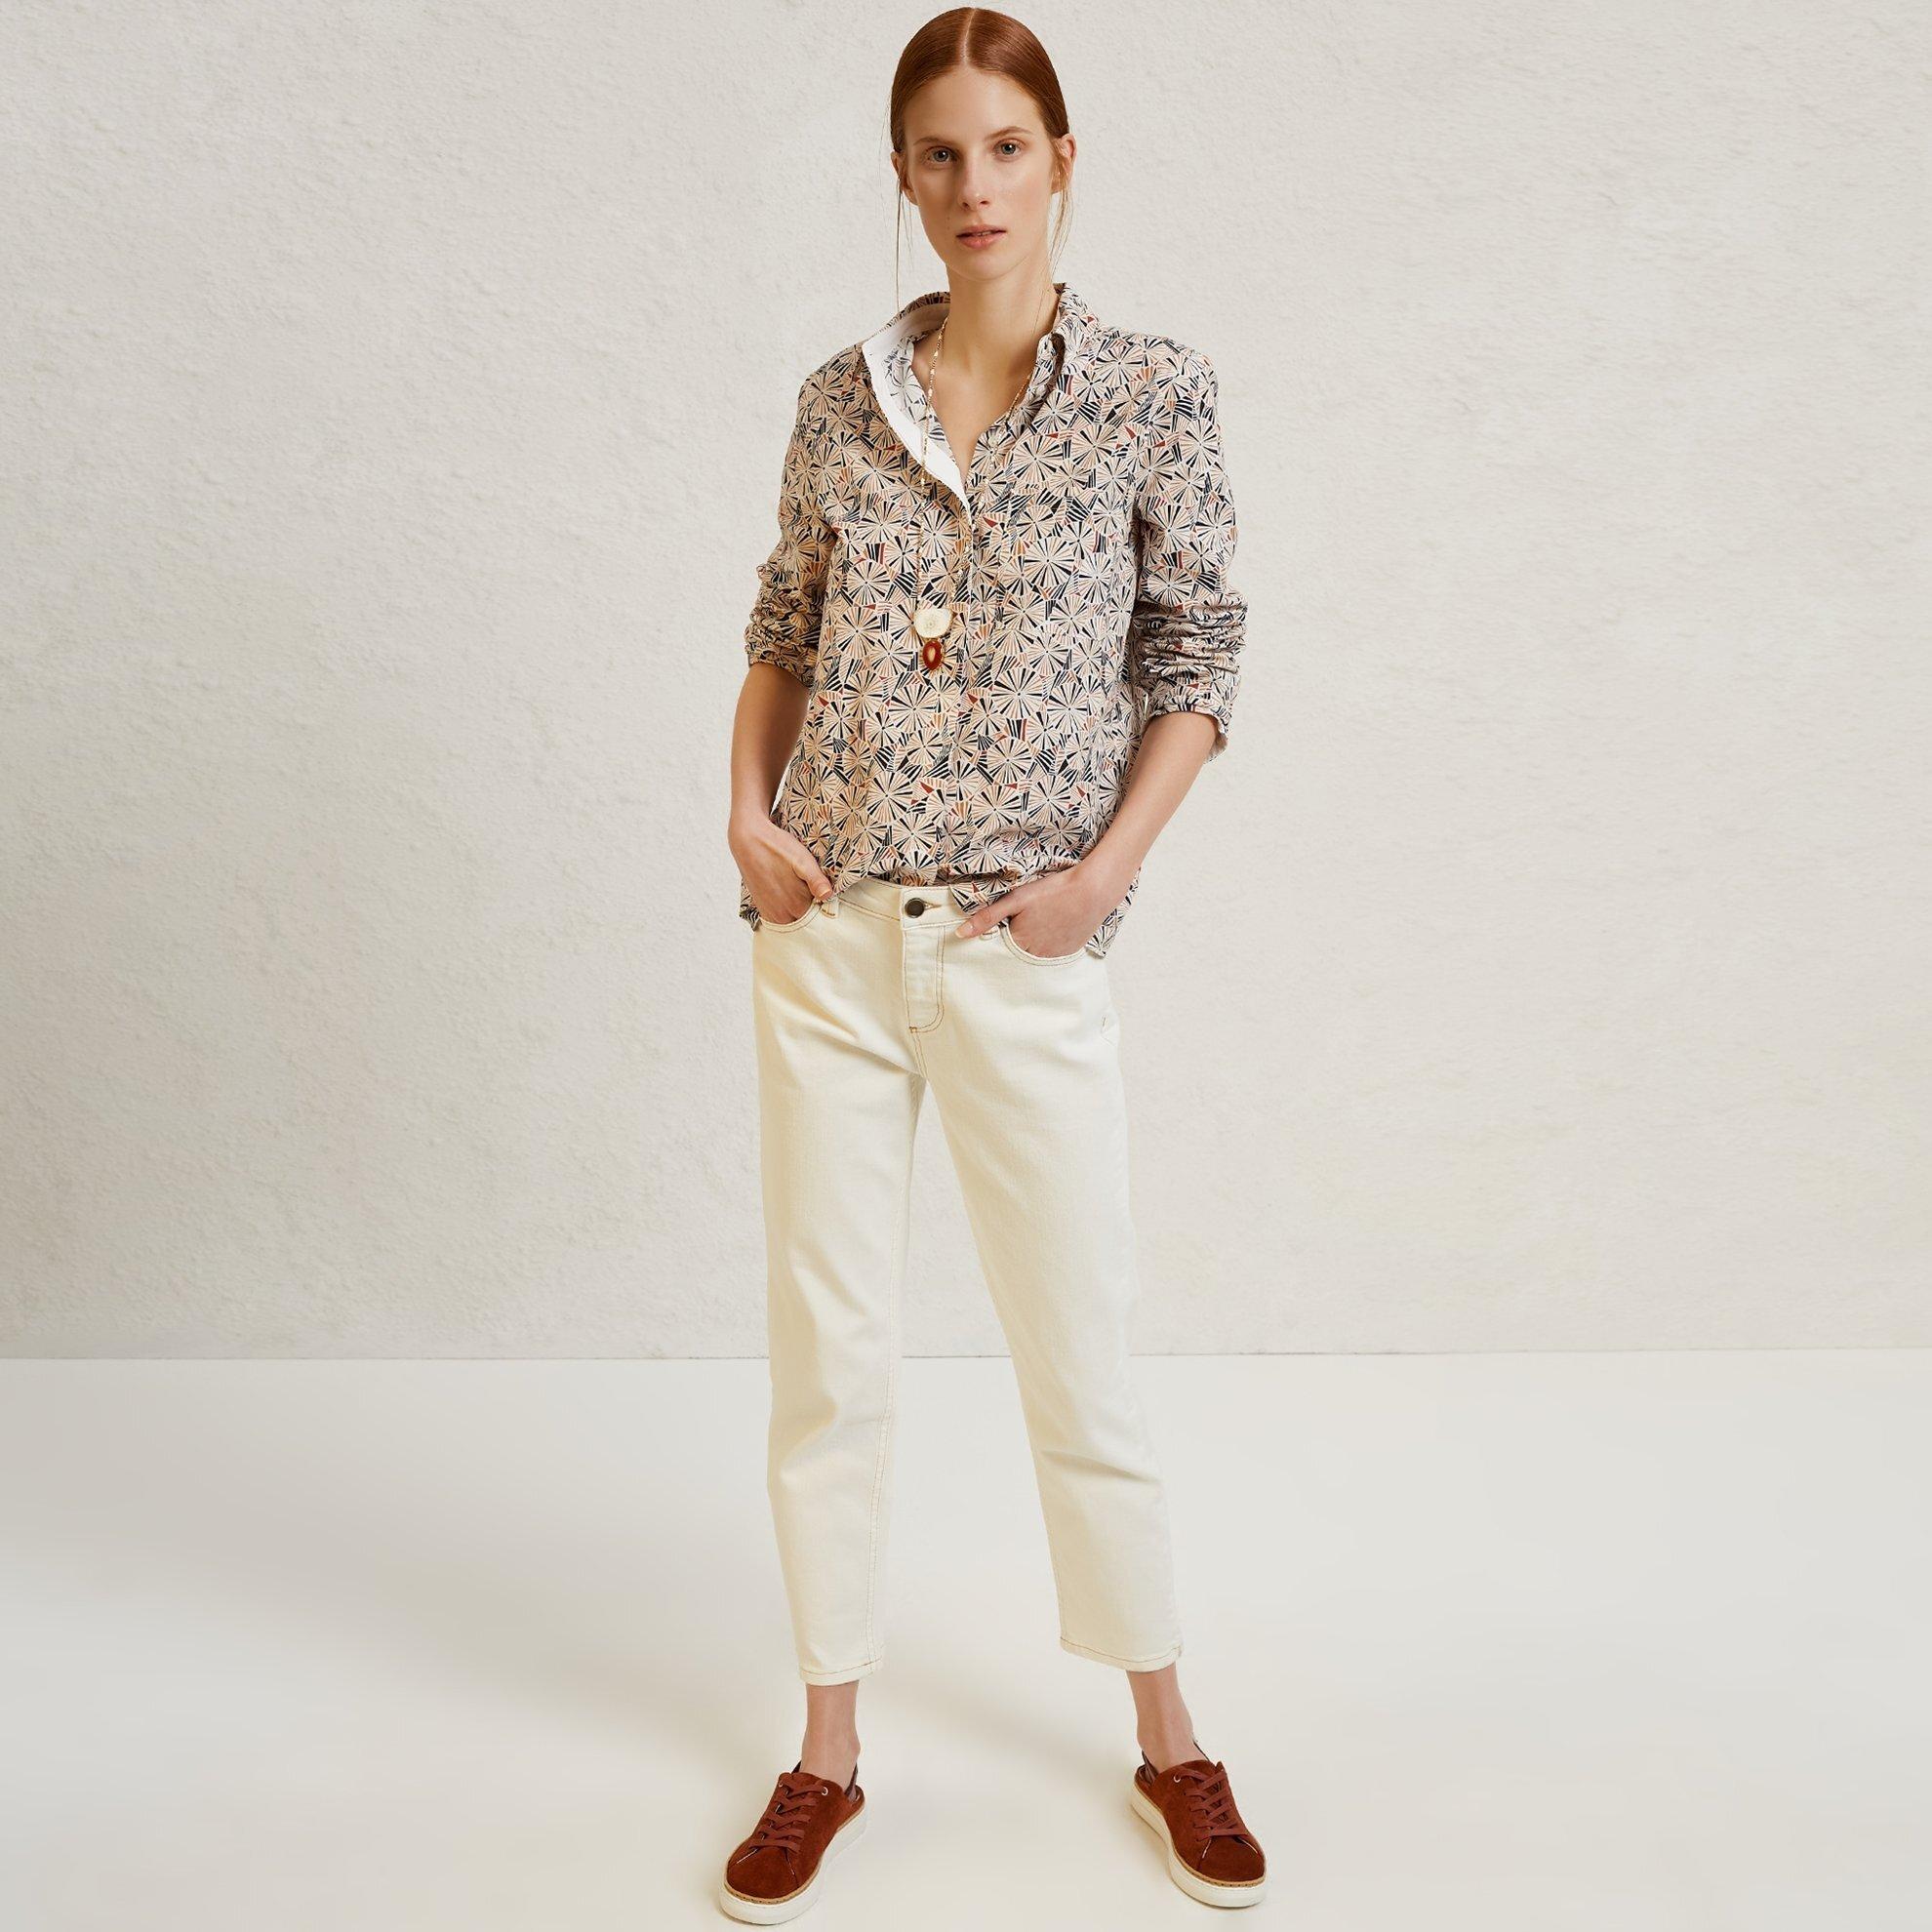 Straight Cut Denim Trousers